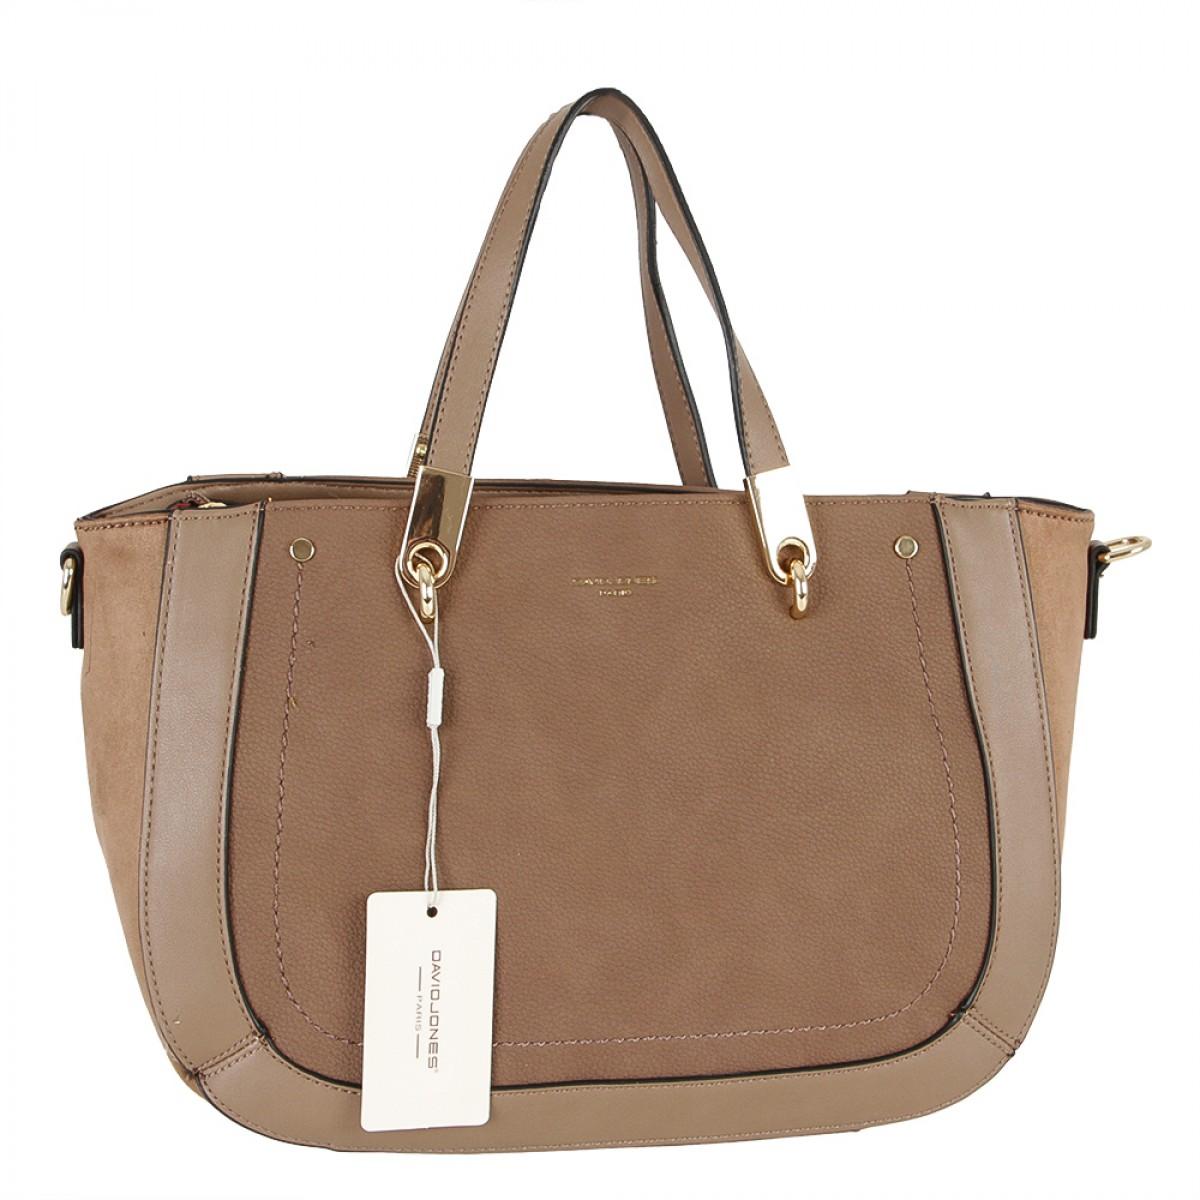 Жіноча сумка David Jones 6168-2 TAUPE